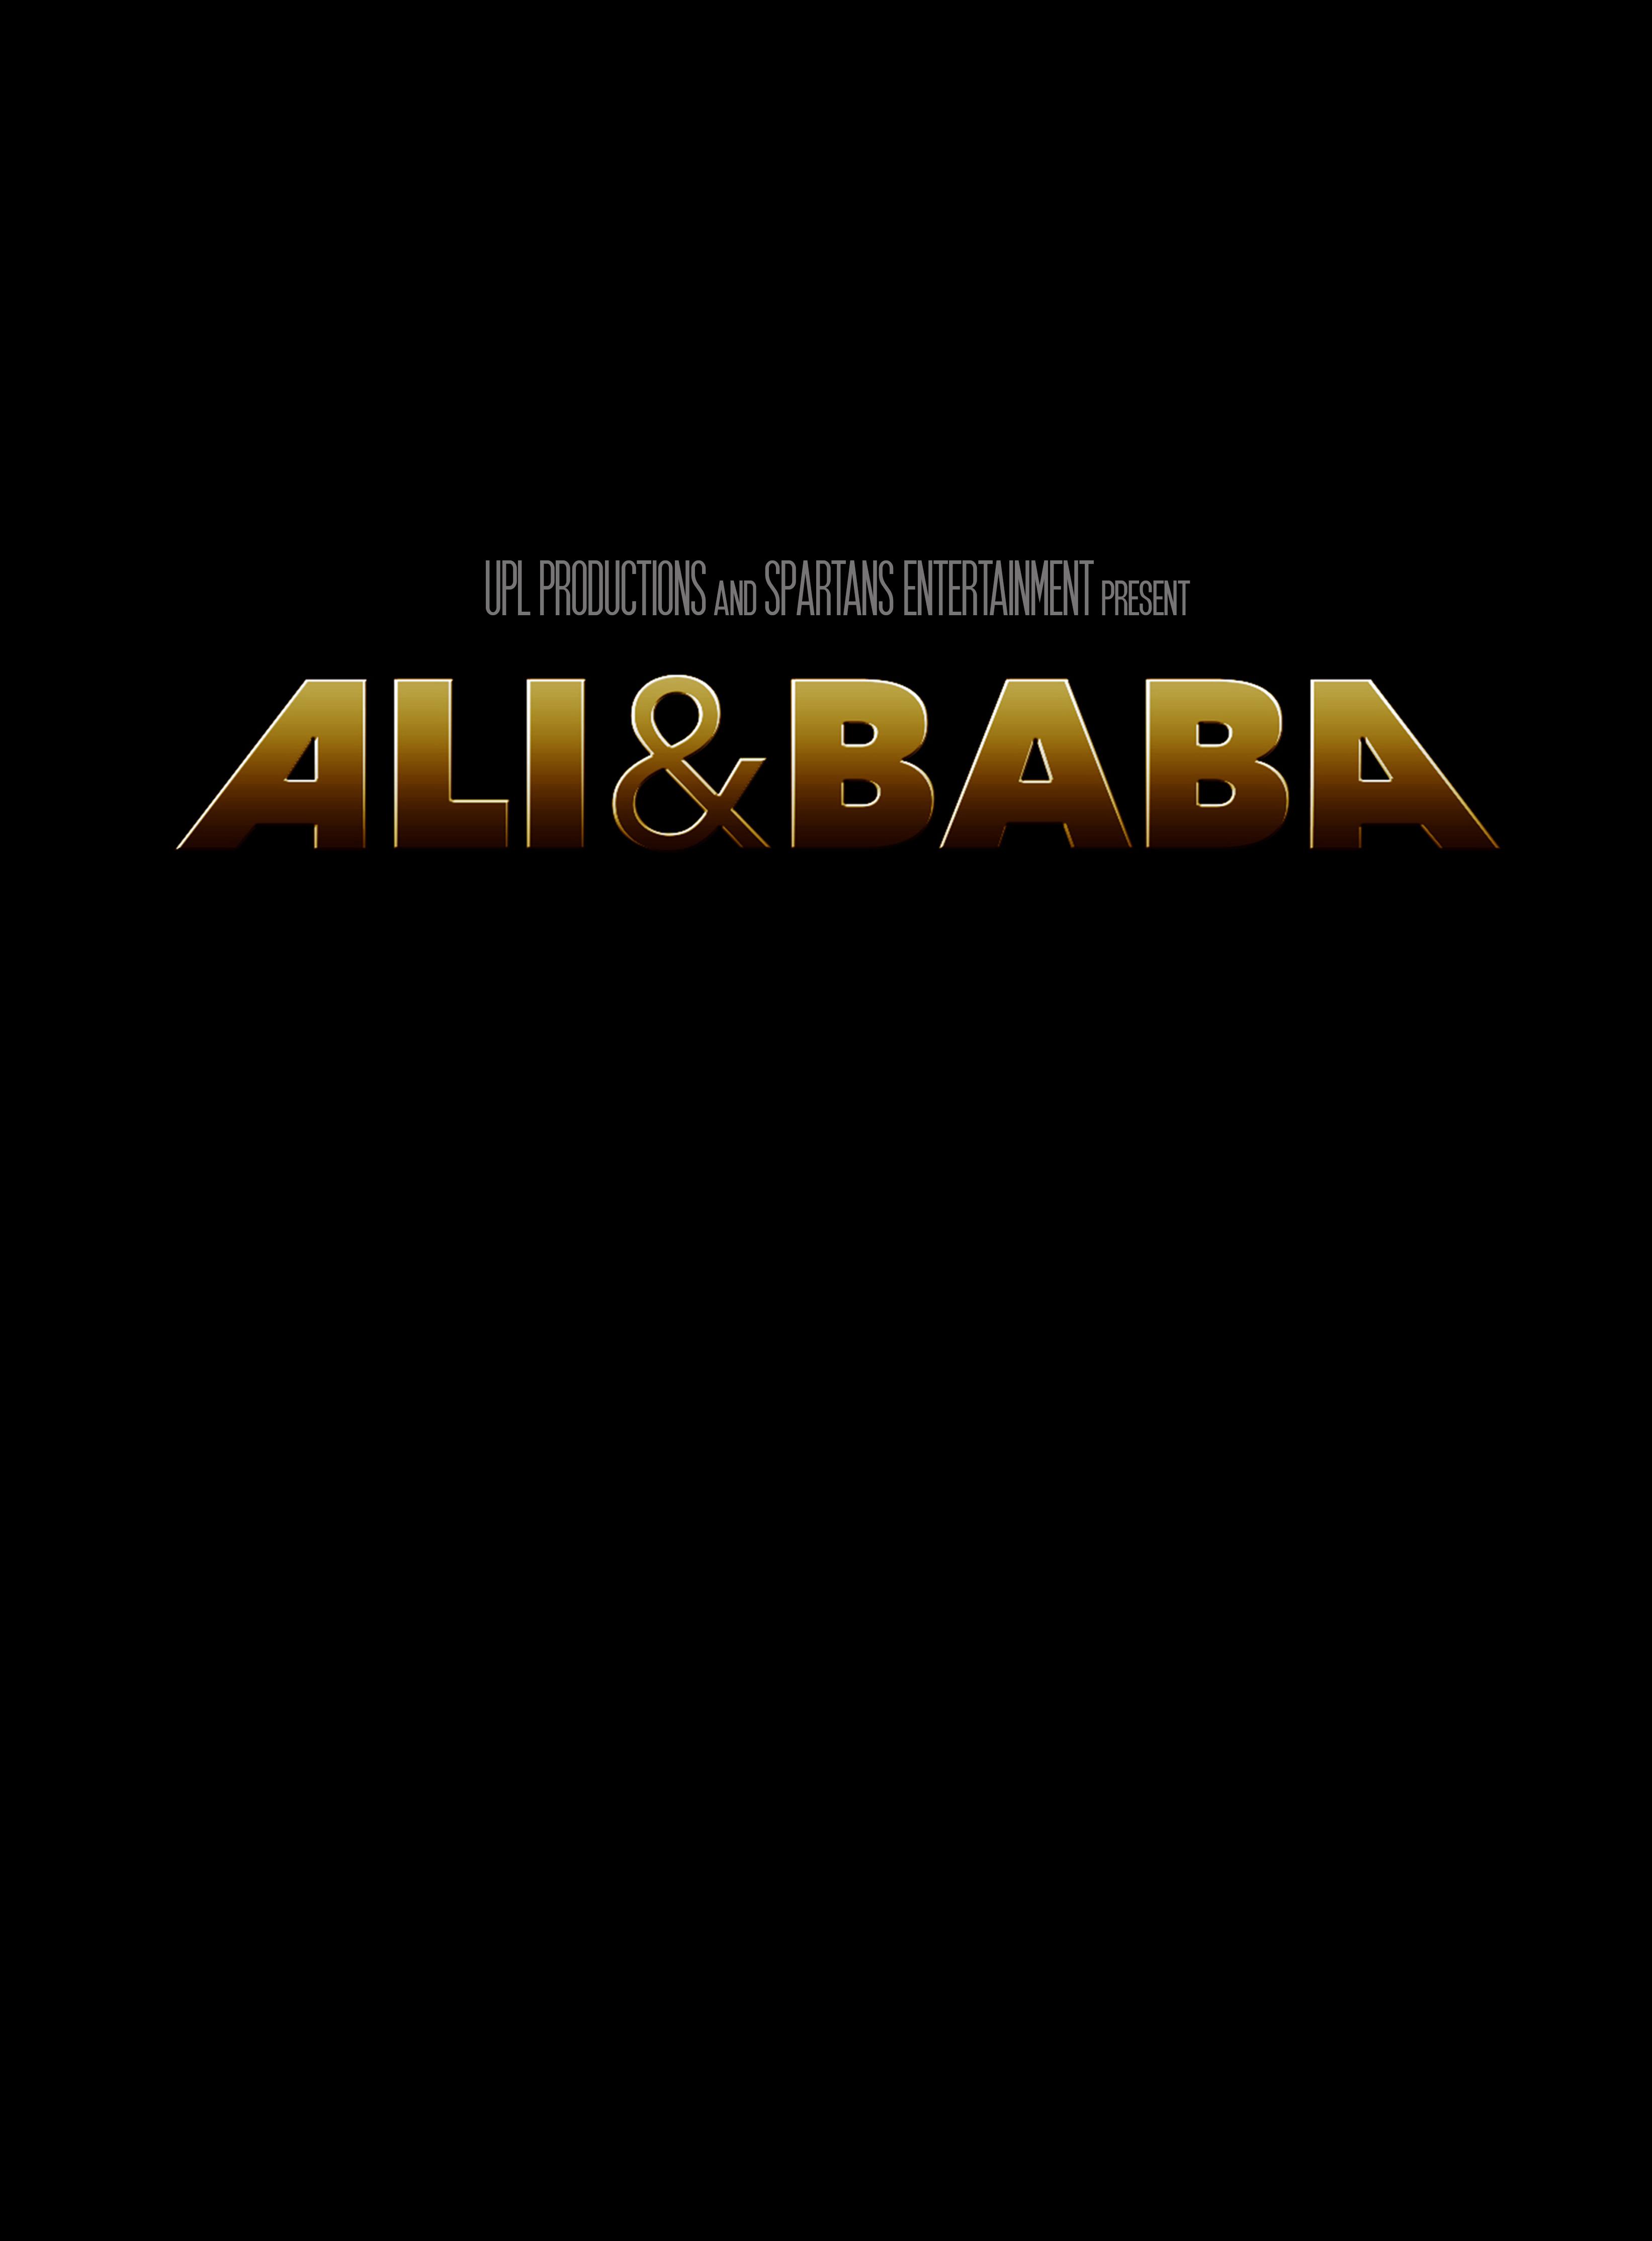 Ali \u0026 Baba